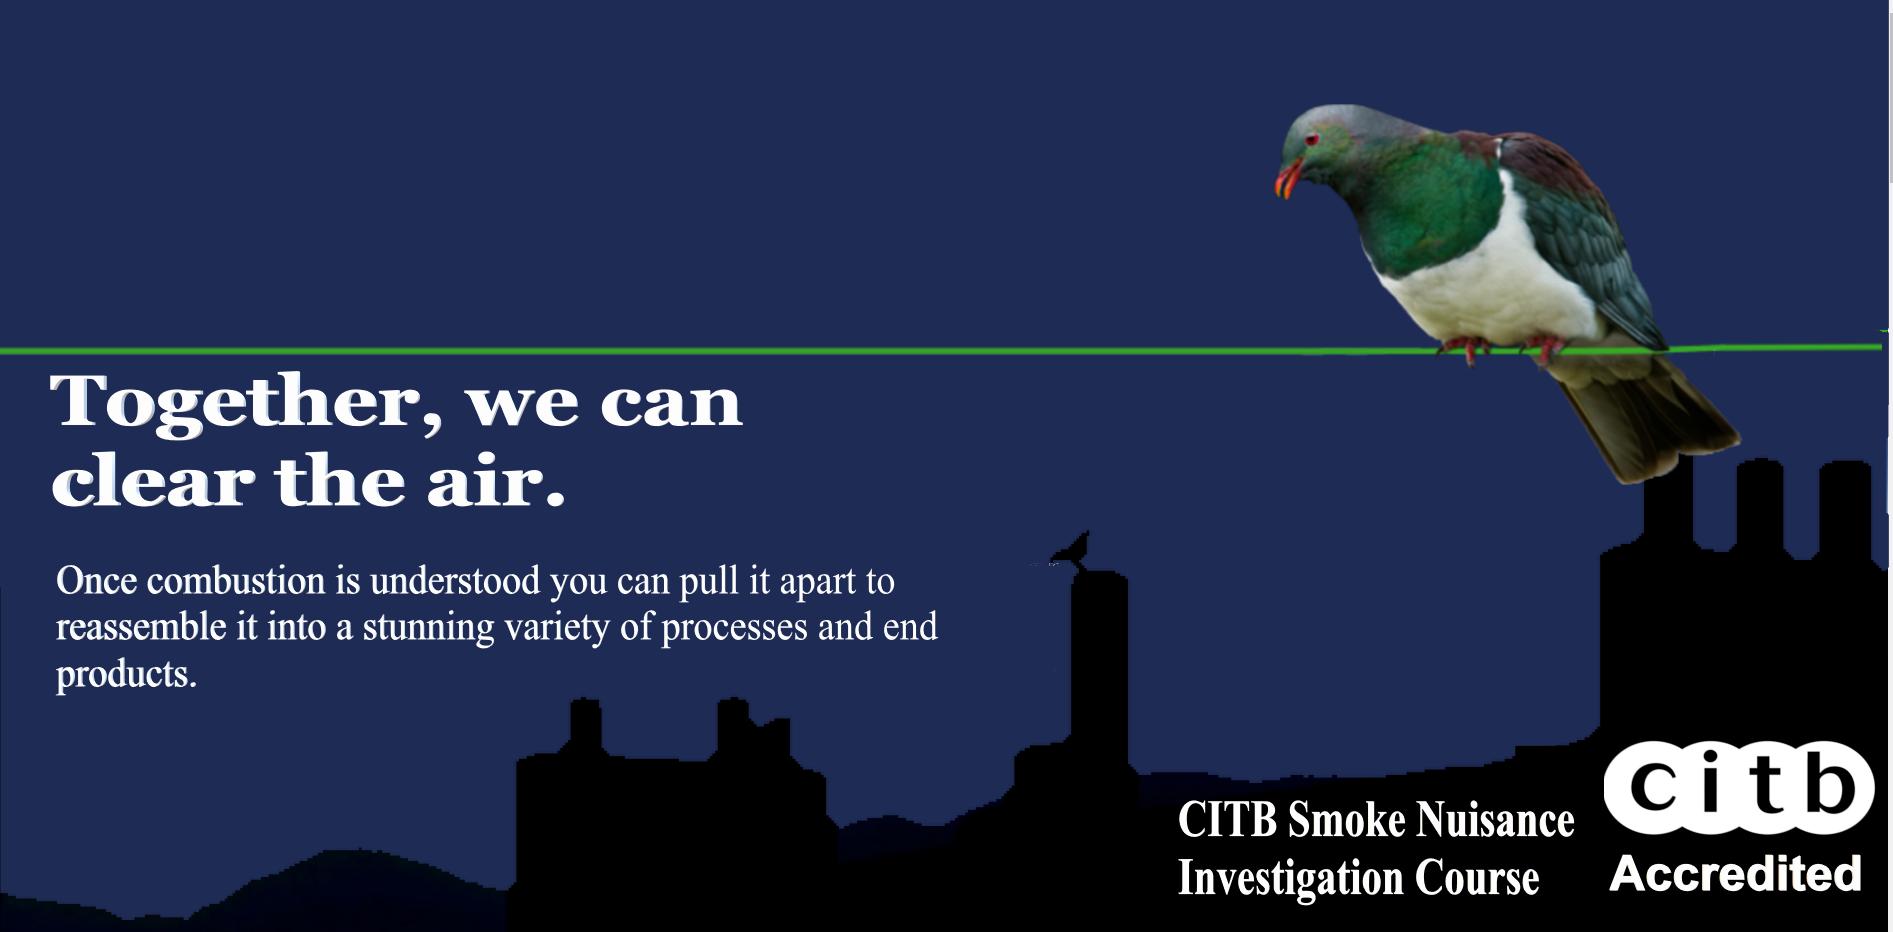 Domestic Smoke Nuisance & Environment